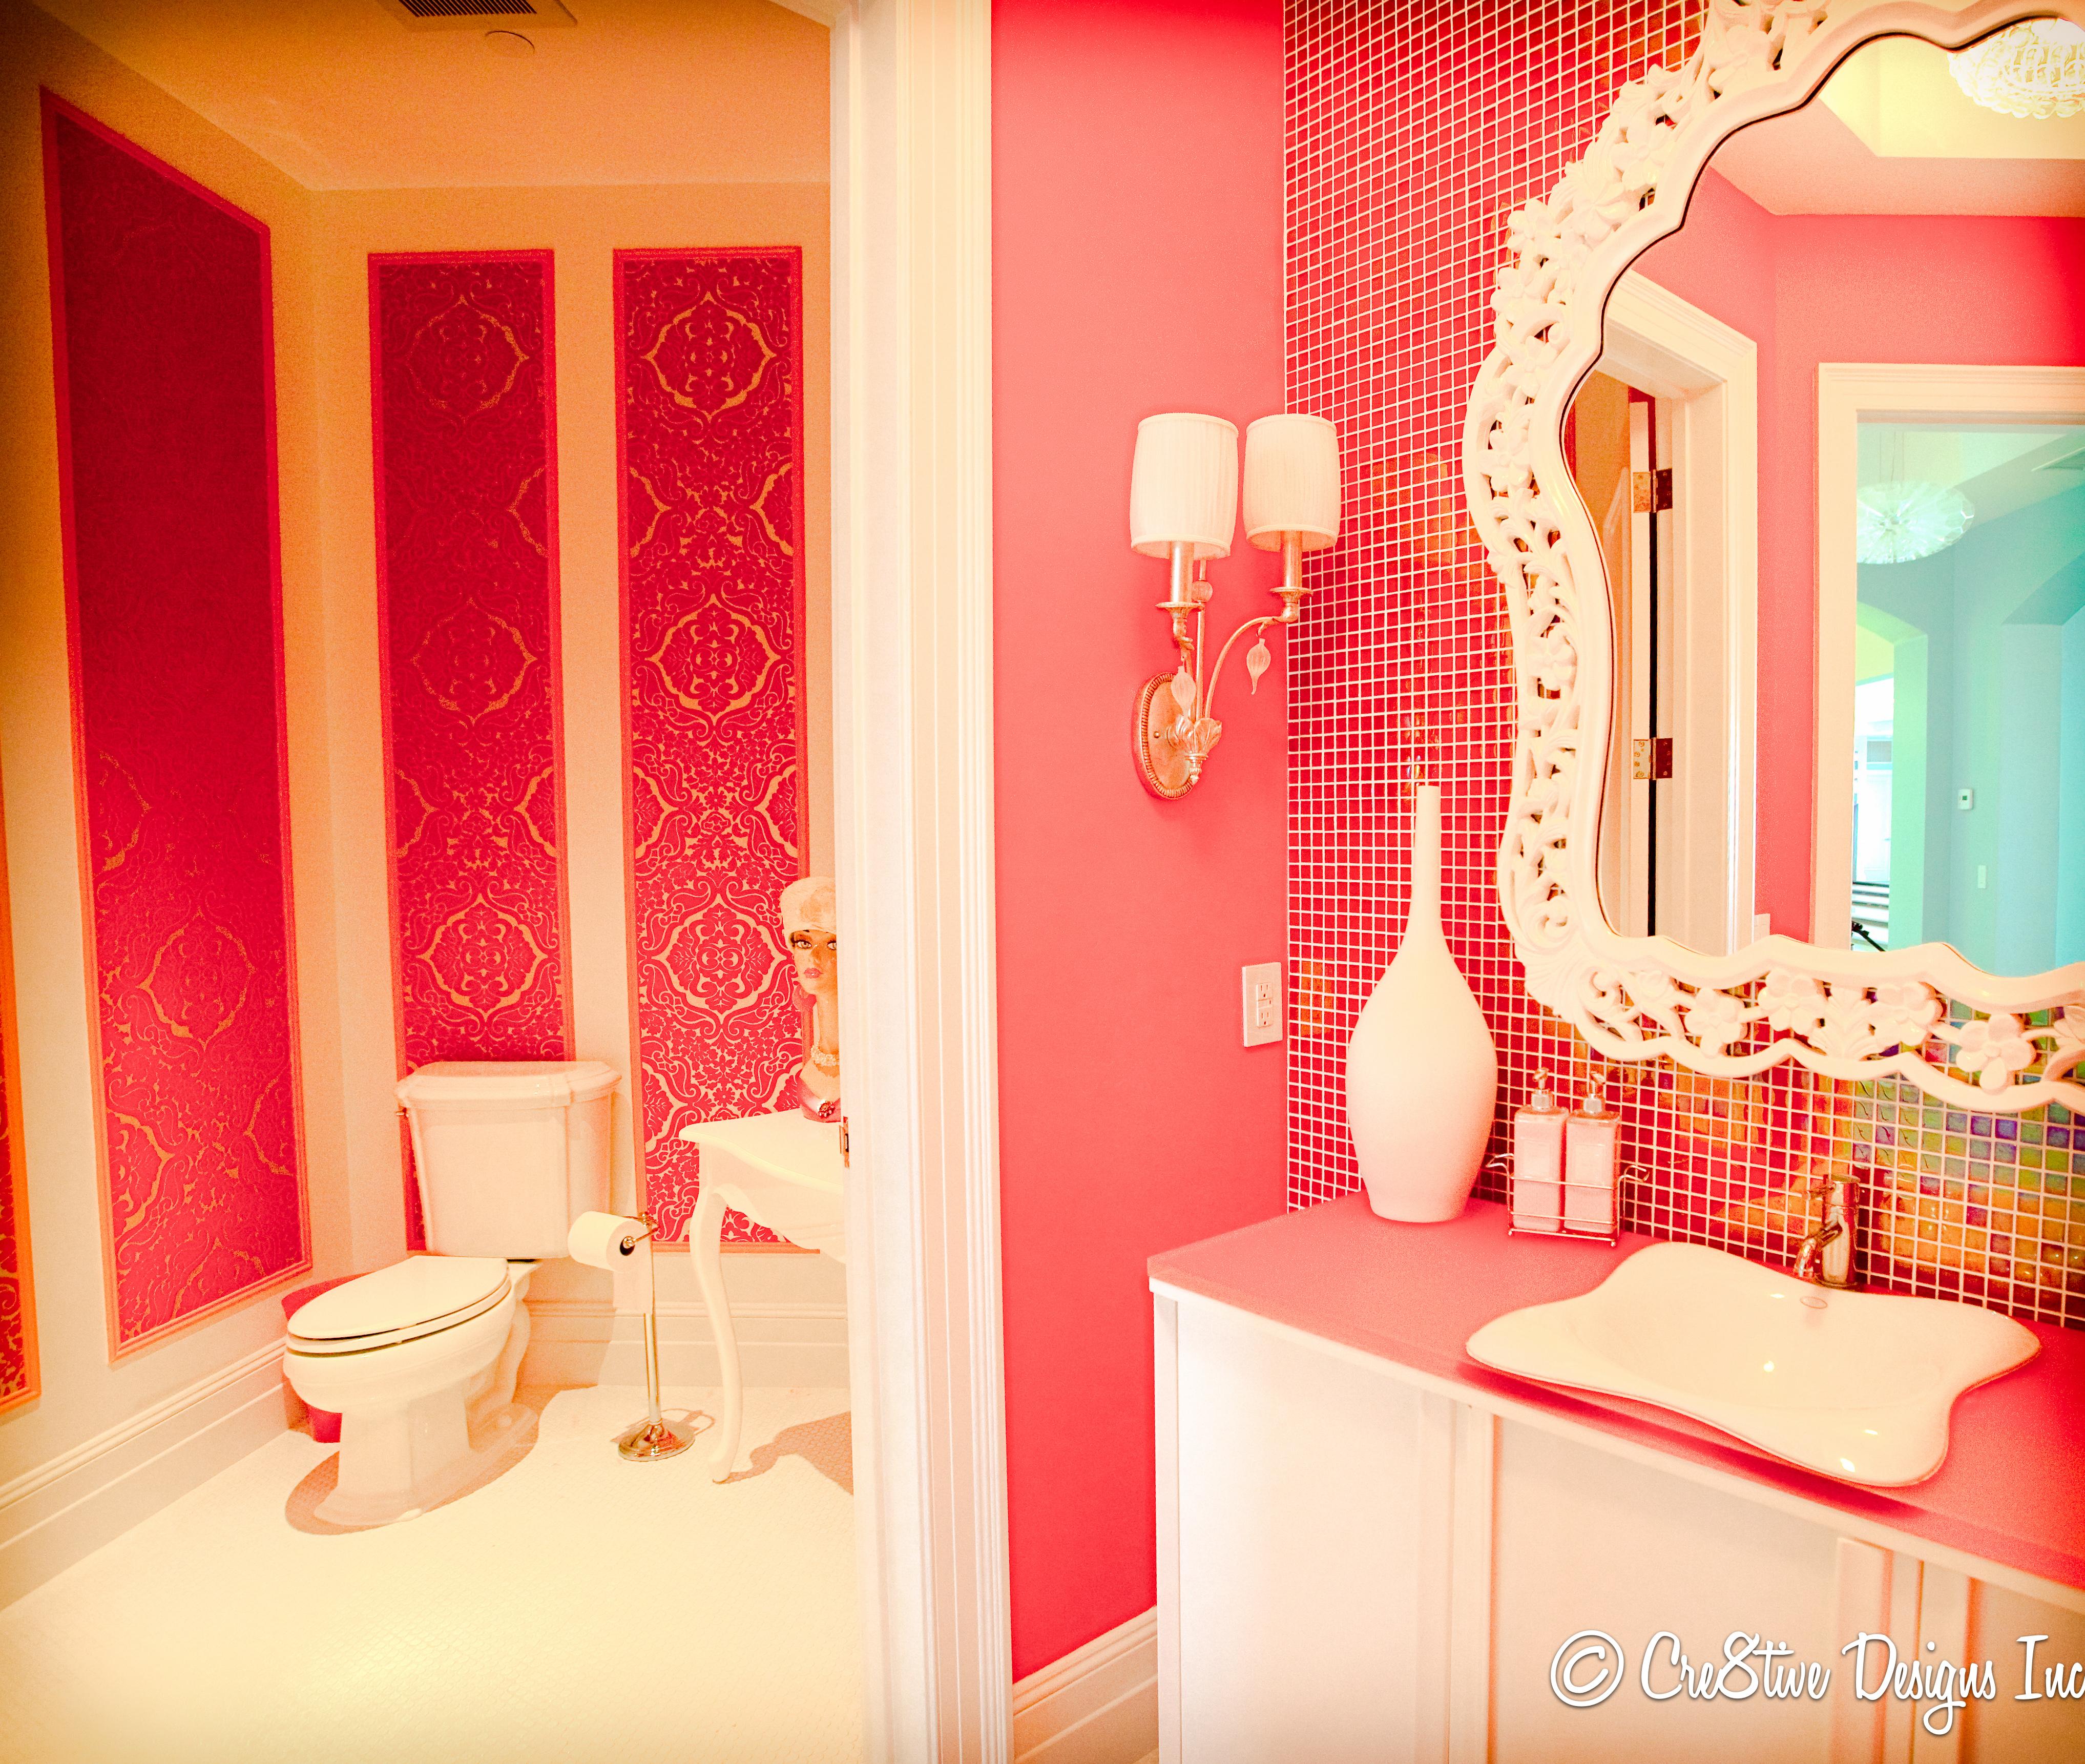 Cheap bathroom wallpaper - Hot Pink Bathrooms But Of Course It Wasn T Cheap